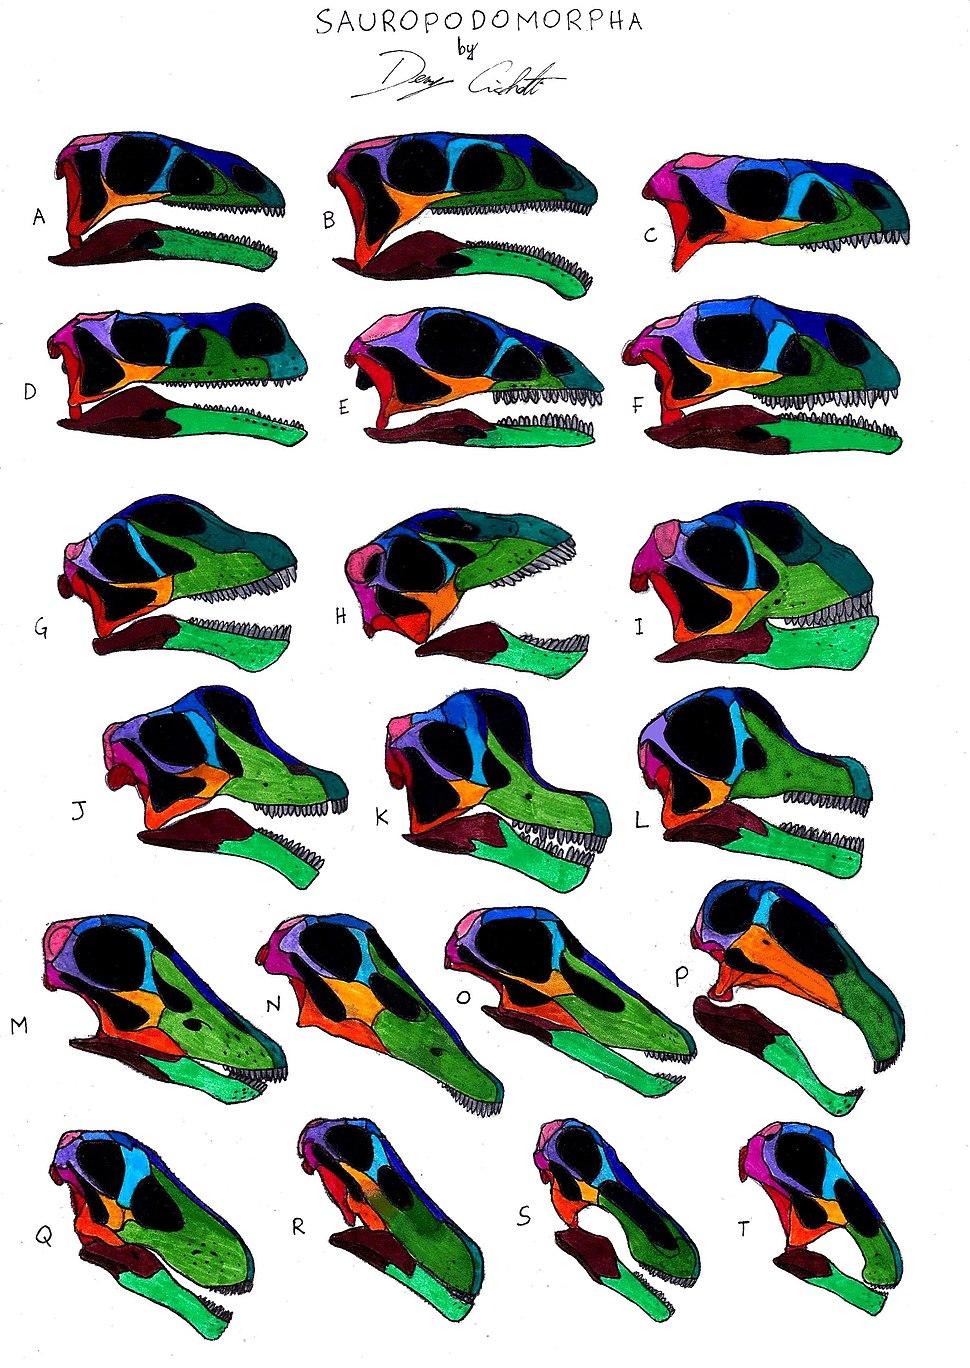 Sauropodomorpha skull comparison